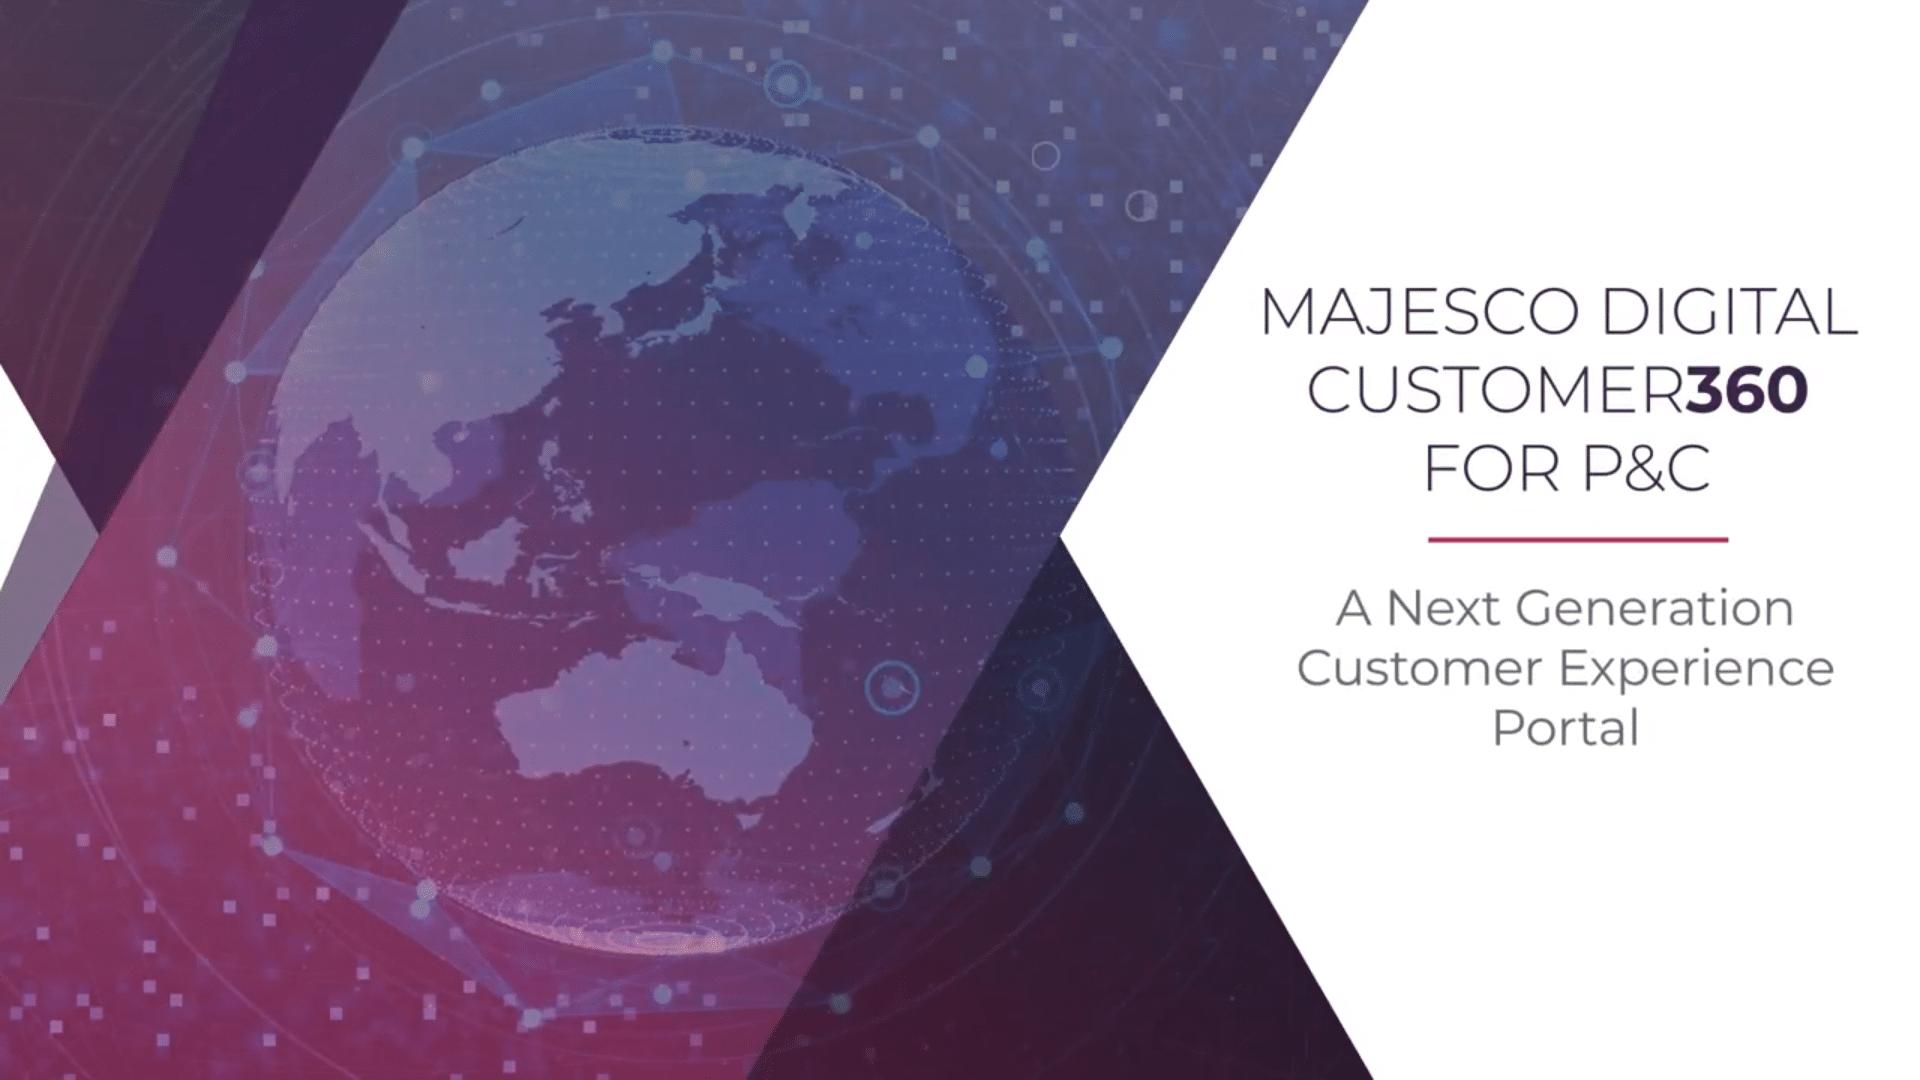 Majesco Digital Customer360 for P&C – A Next Generation Customer Experience Portal